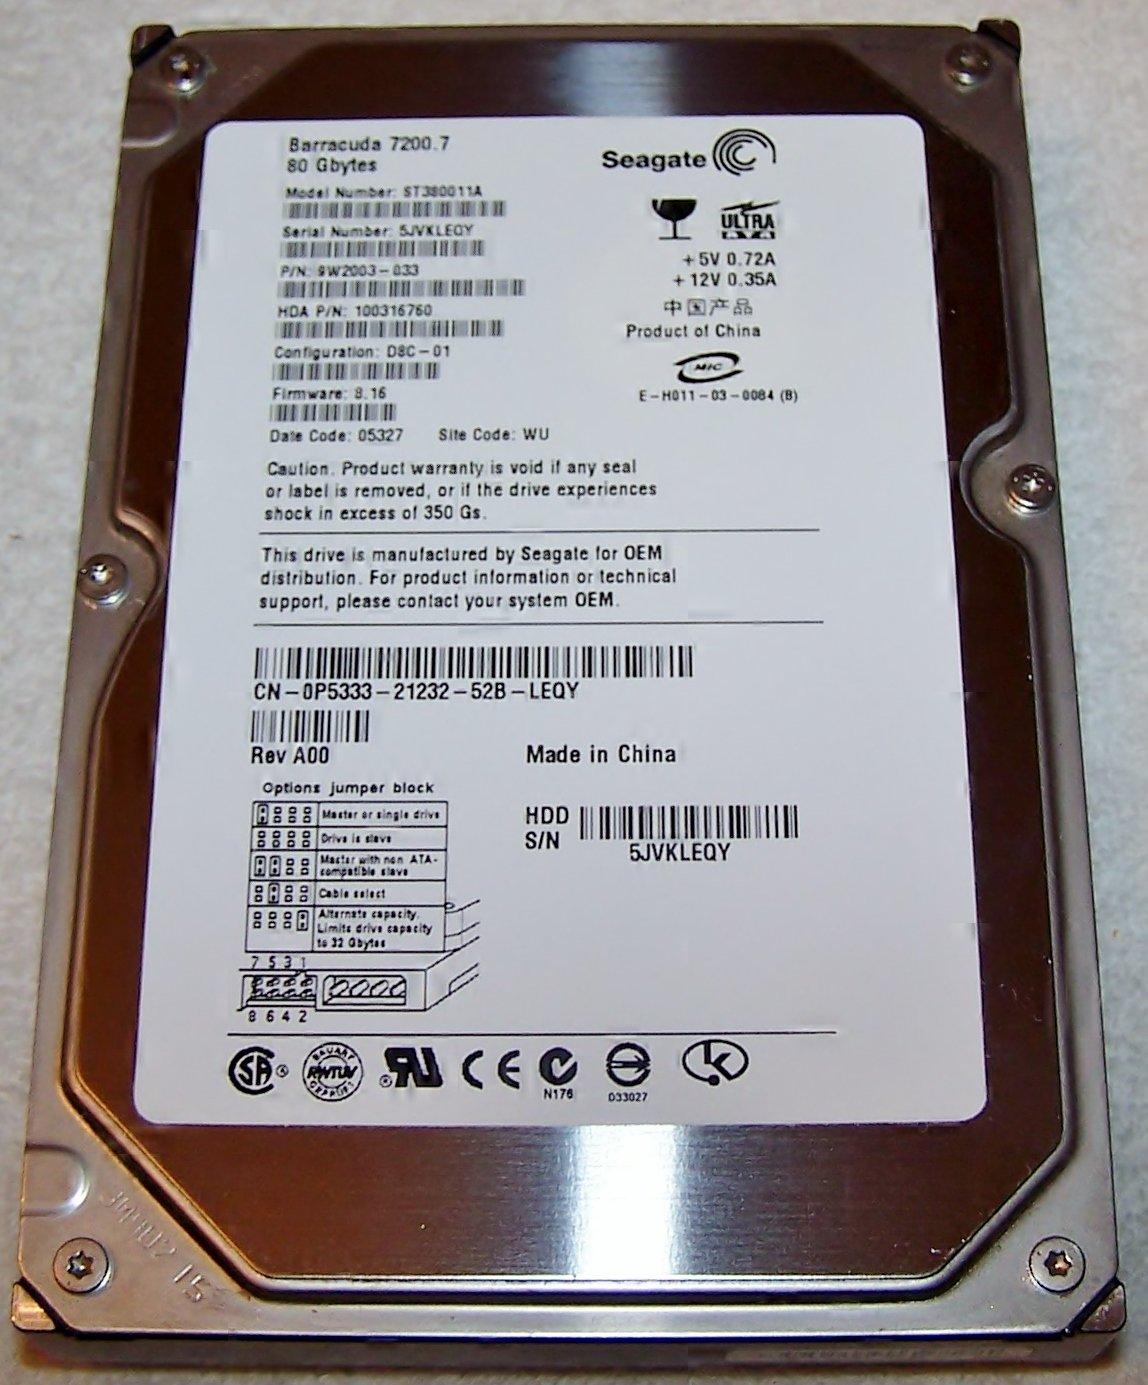 SEAGATE Barracuda Model ST380011A 80GB IDE Hard Drive